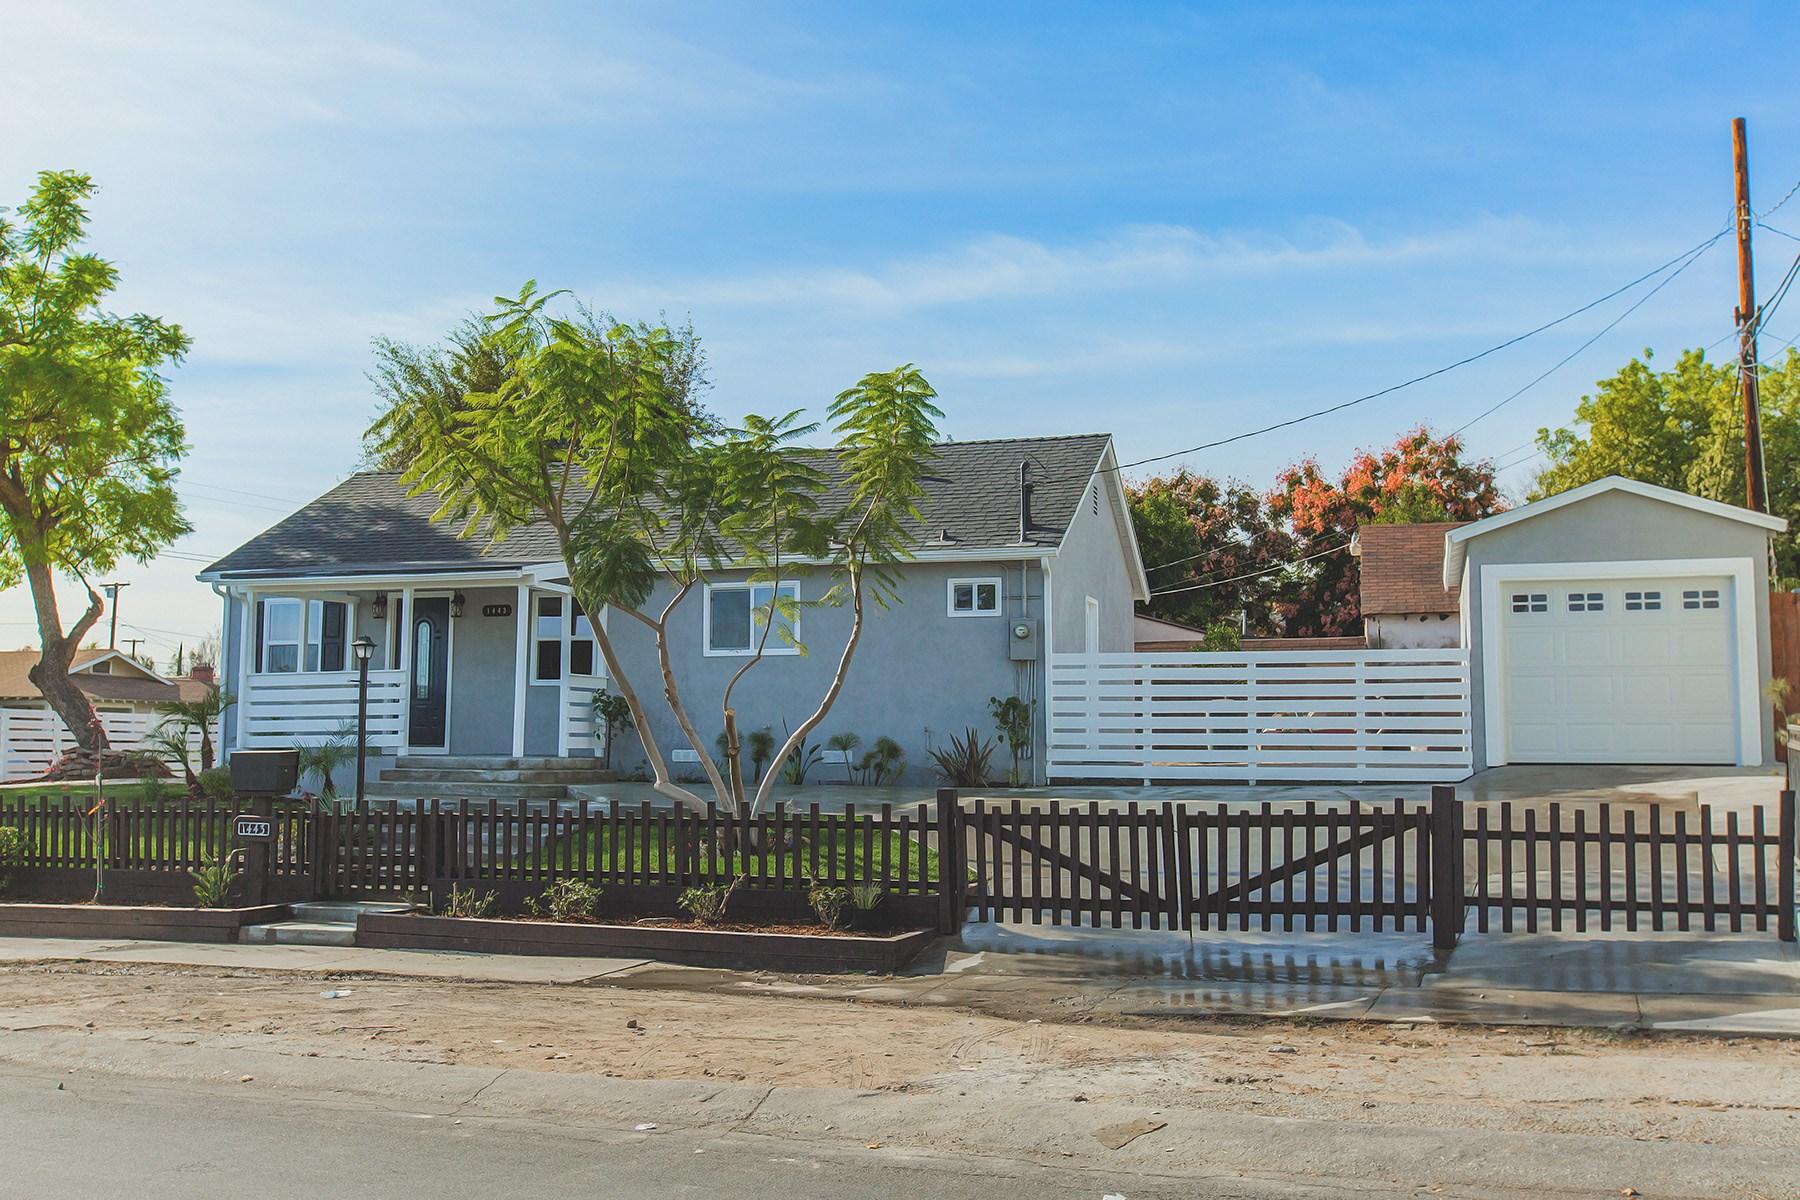 Single Family Home for Sale at Pristine Pasadena Pepper 1443 Pepper Dr Pasadena, California 91104 United States